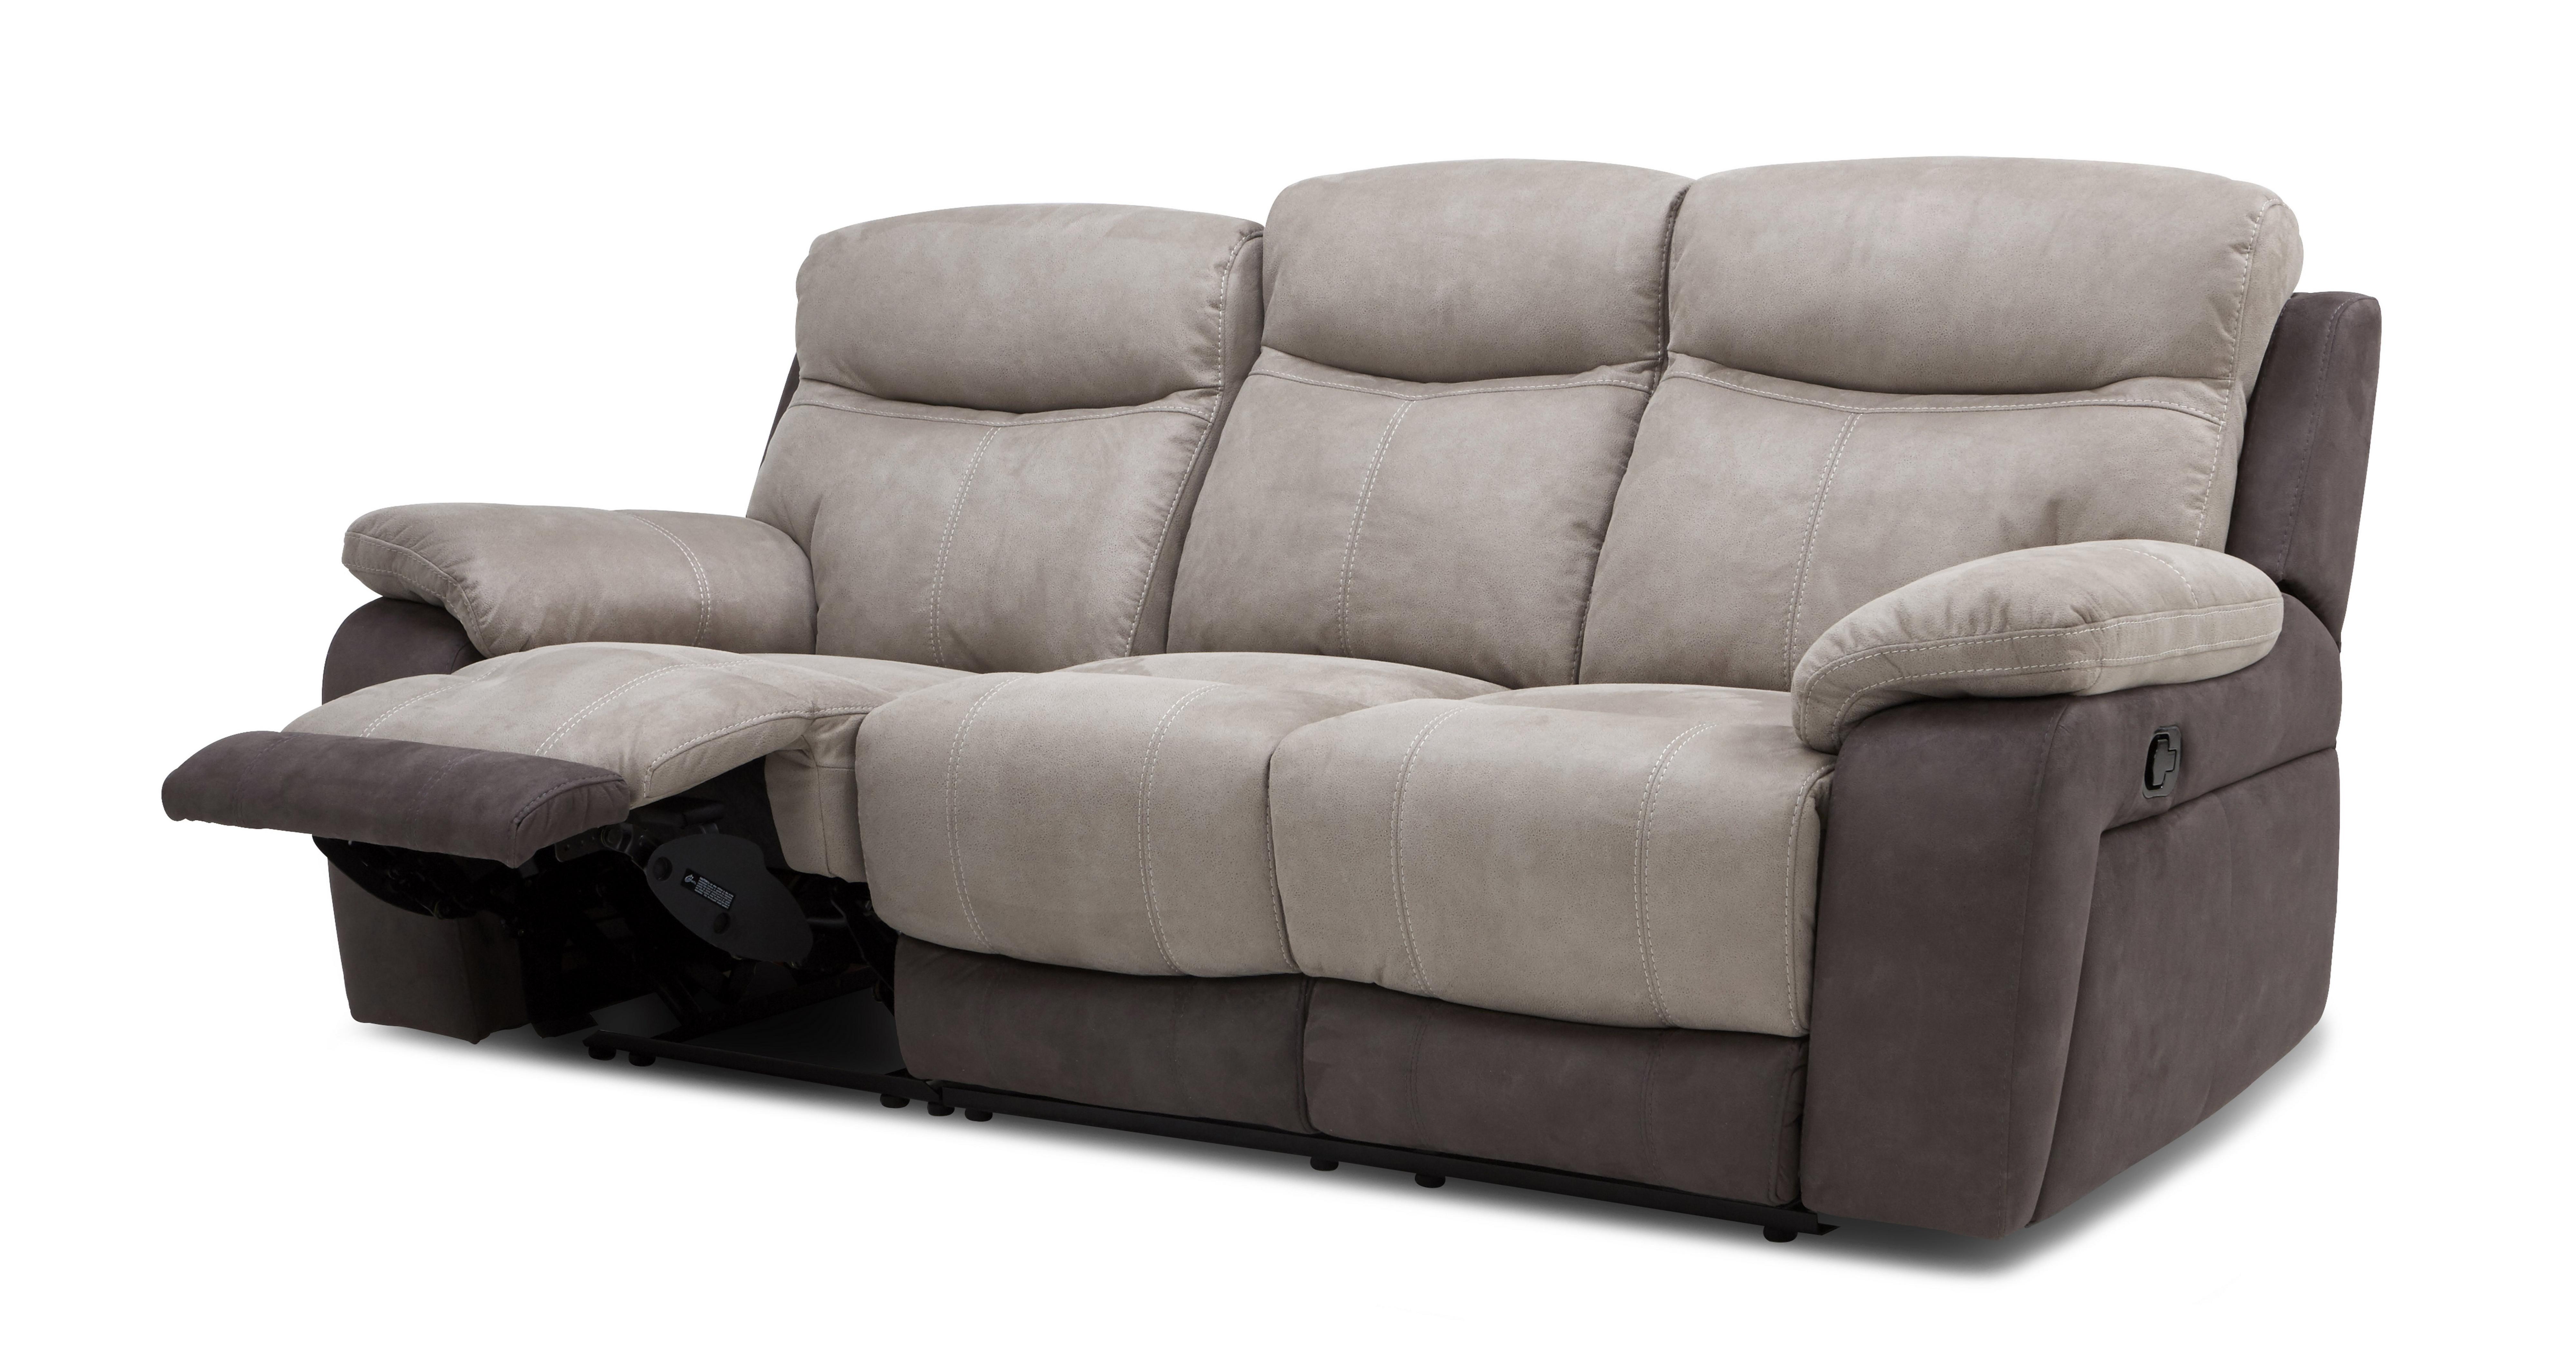 Dfs Brown Leather Recliner Sofa Brokeasshome Com